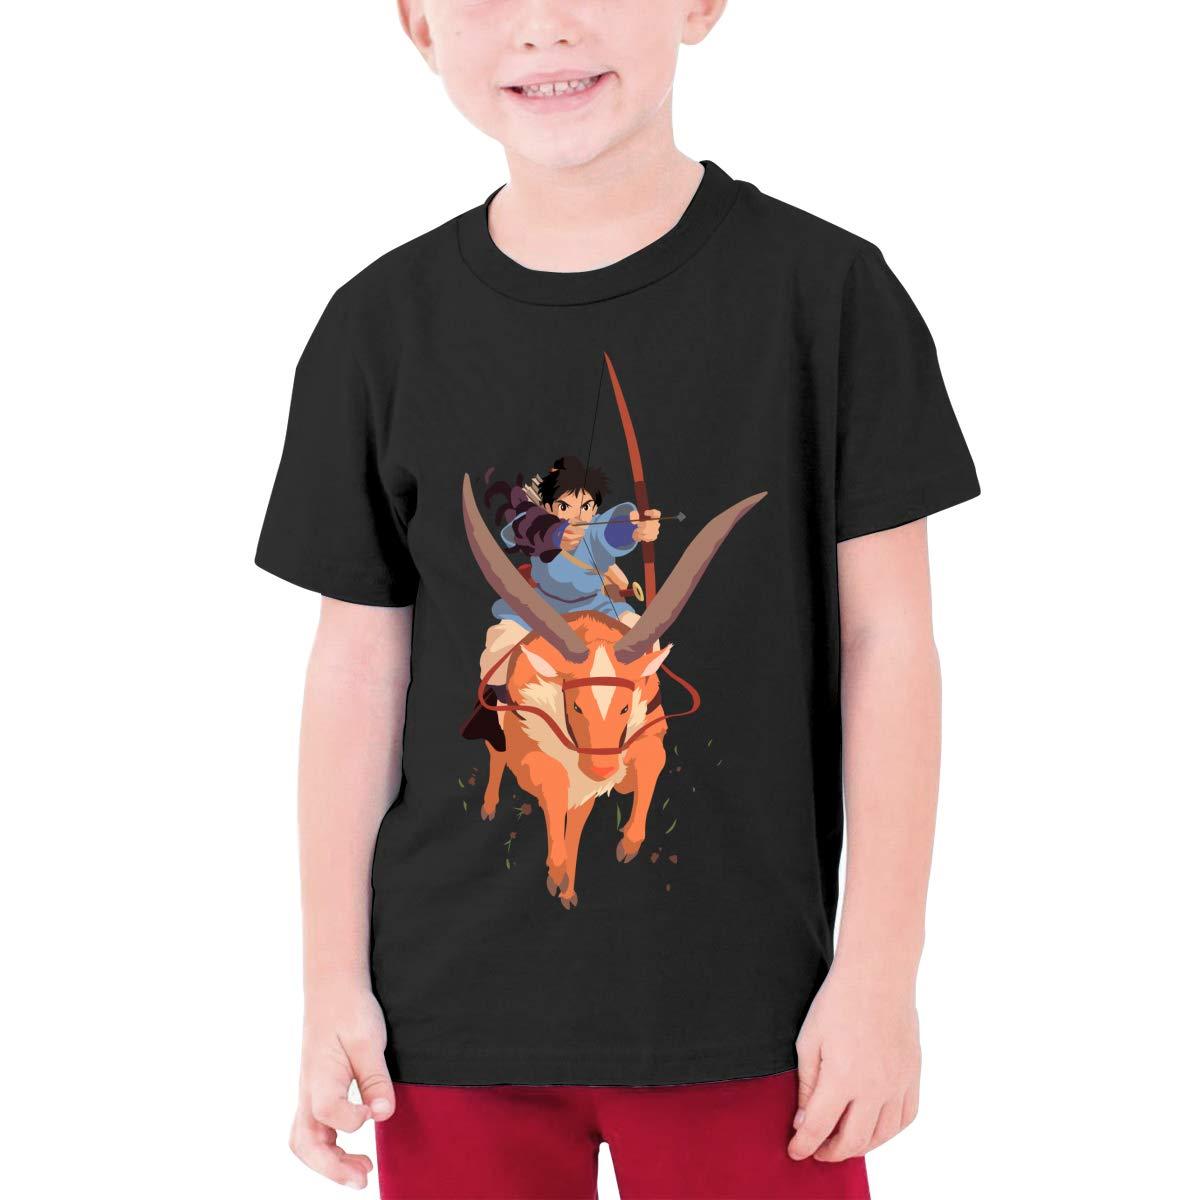 LOUHART Design Princess Mono Knight Funny T Shirts O-Neck for Teenagers Black